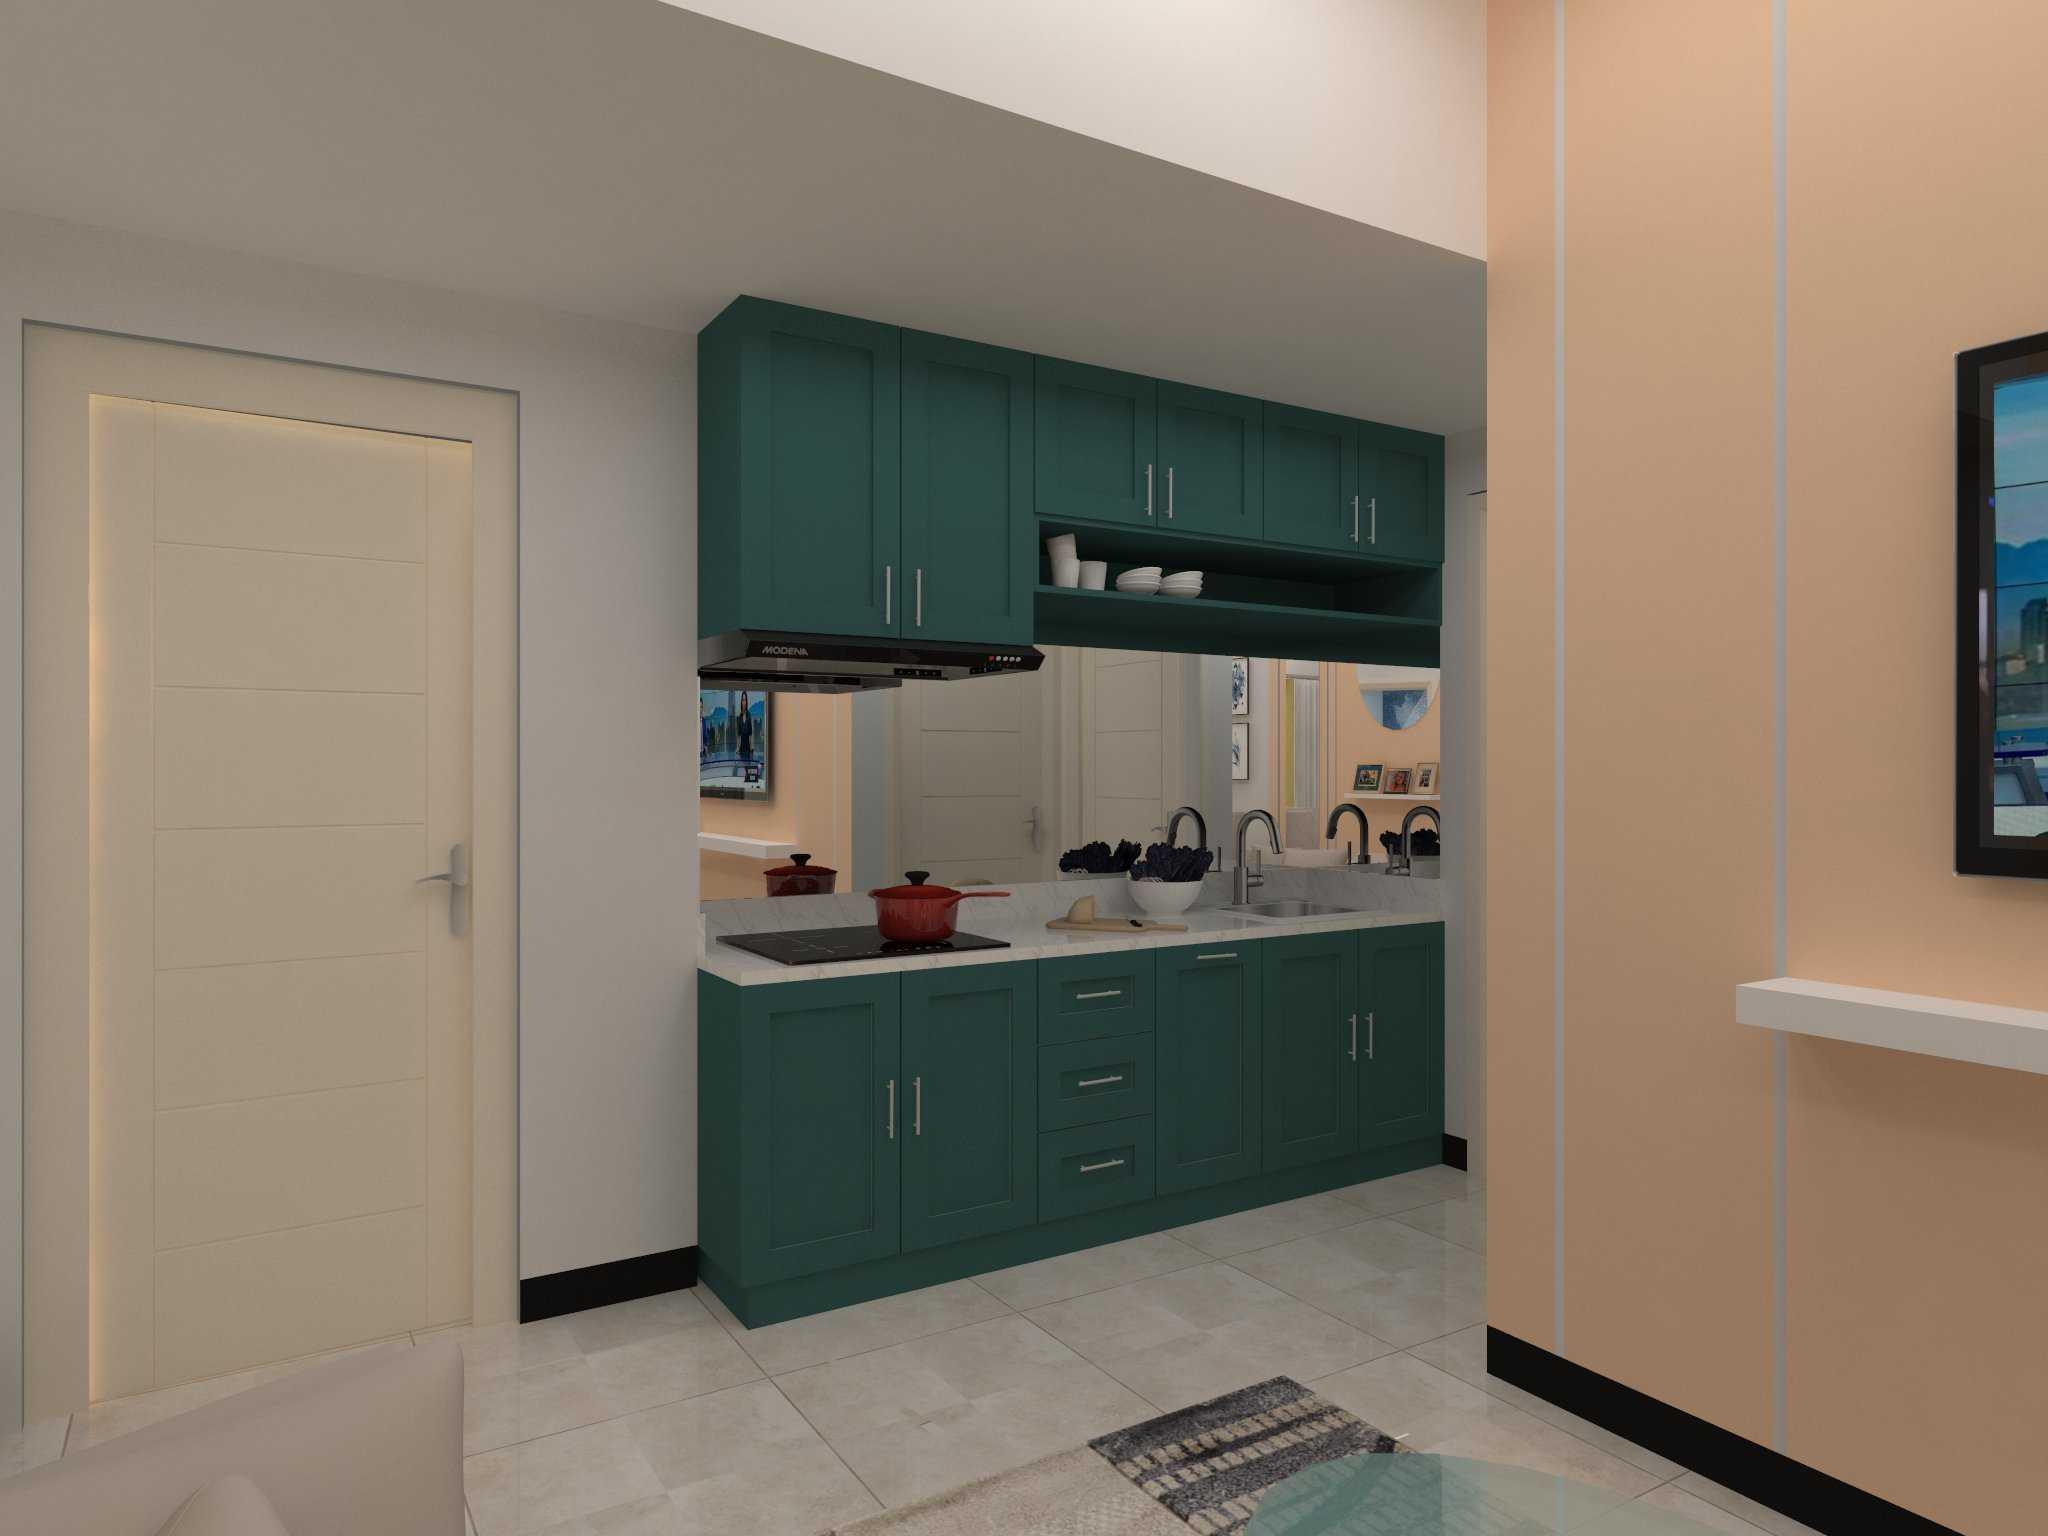 Efarsitek Studio Apartemen Benson Surabaya, Kota Sby, Jawa Timur, Indonesia Surabaya, Kota Sby, Jawa Timur, Indonesia Efarsitek-Studio-Apartemen-Benson  130436